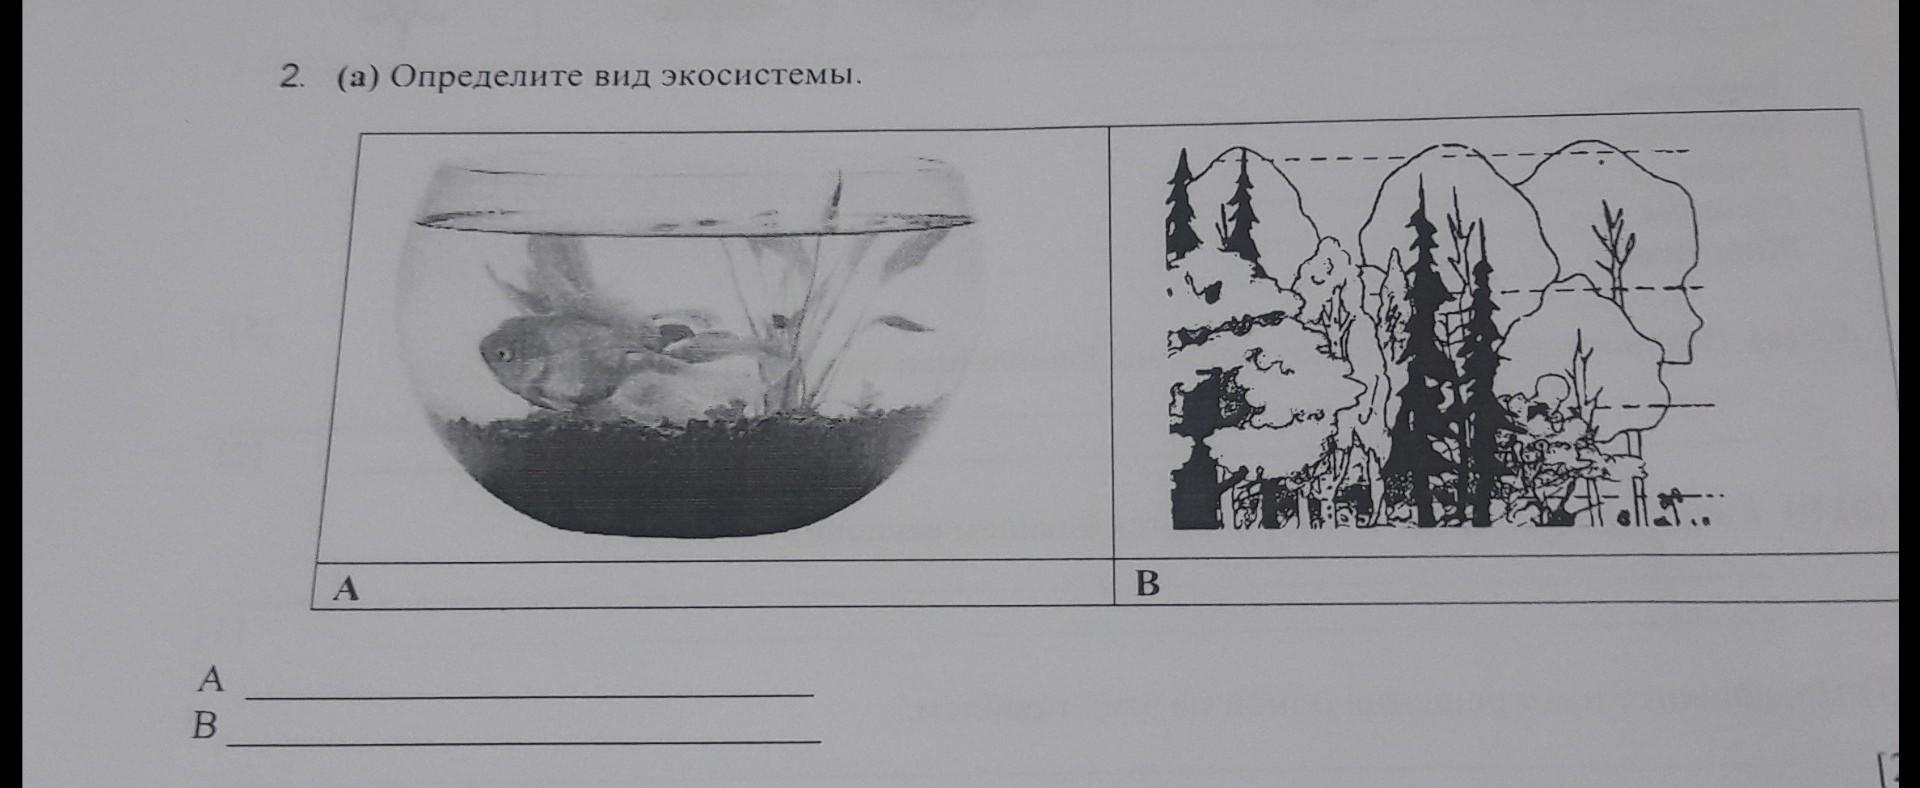 Опредилите вид экосистем